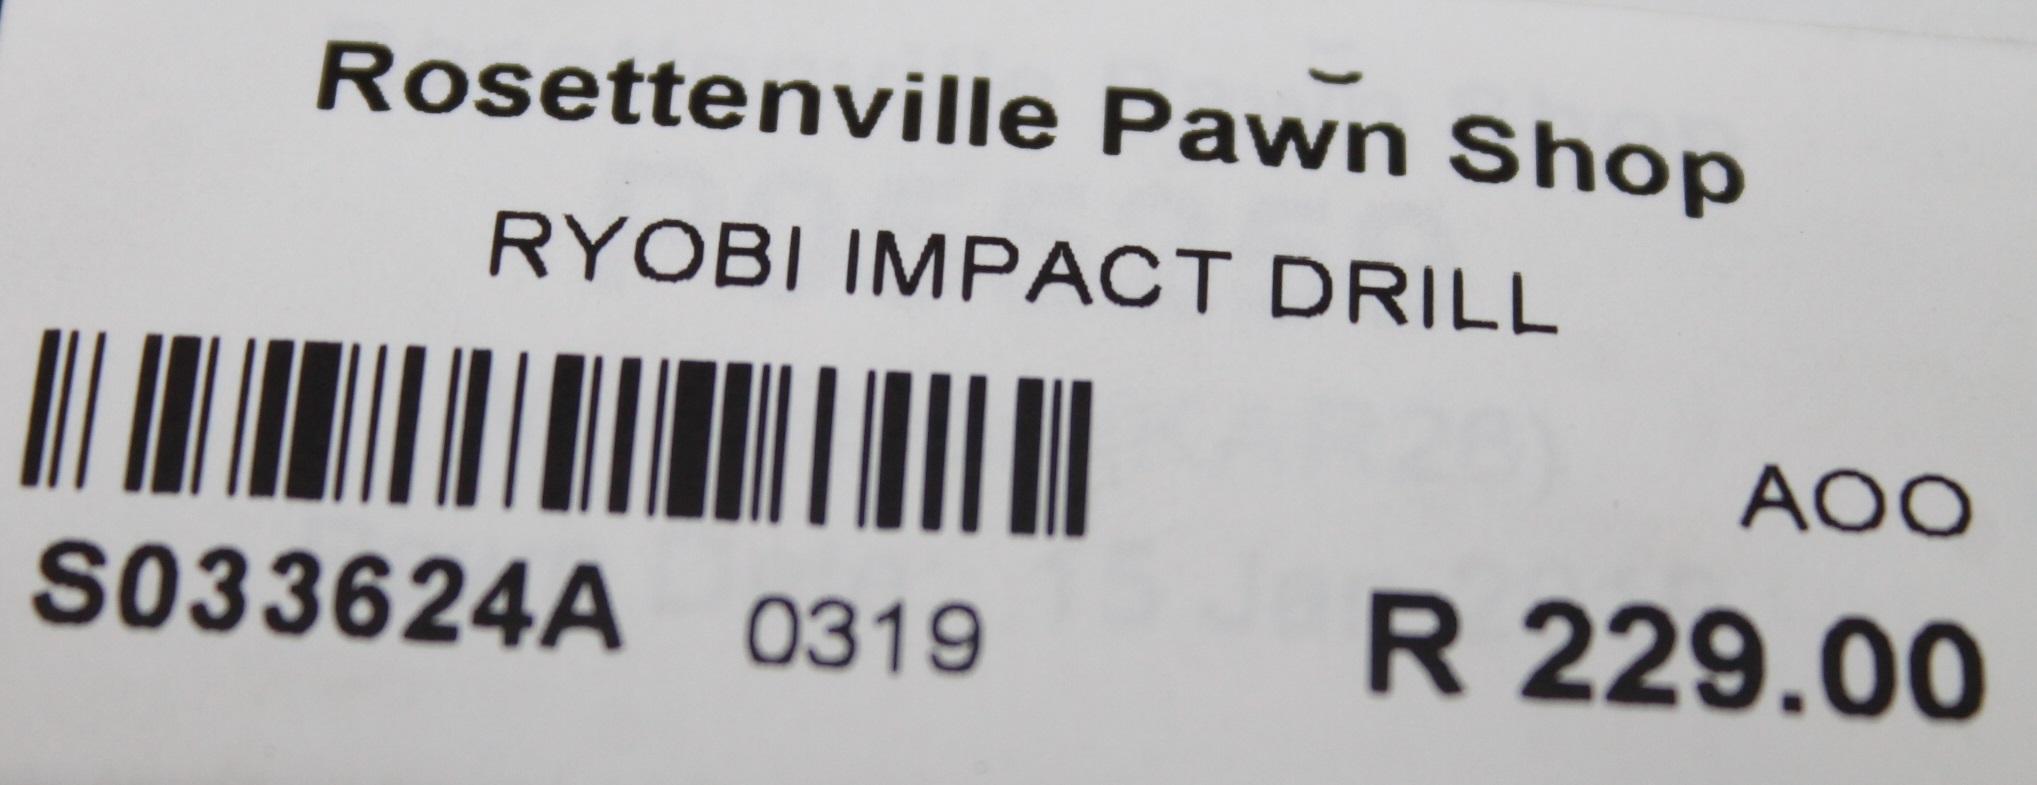 Ryobi impact drill S033624A #Rosettenvillepawnshop